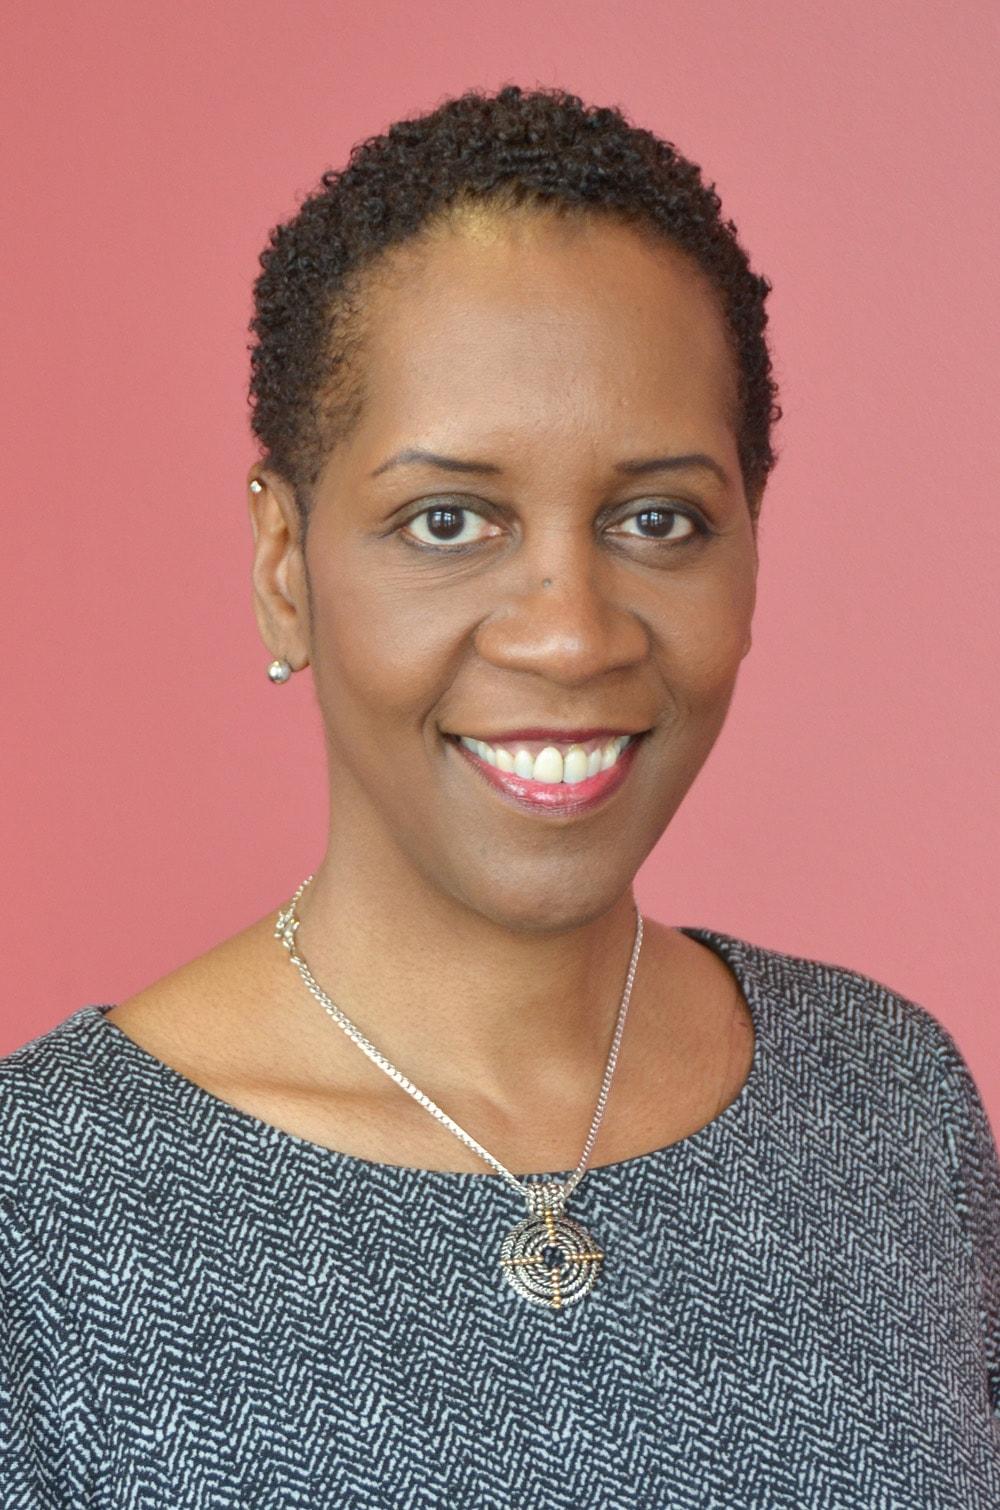 The Rev. Wanda Bynum Duckett, superintendent, Baltimore Metropolitan District. Photo courtesy of the Baltimore-Washington Conference.